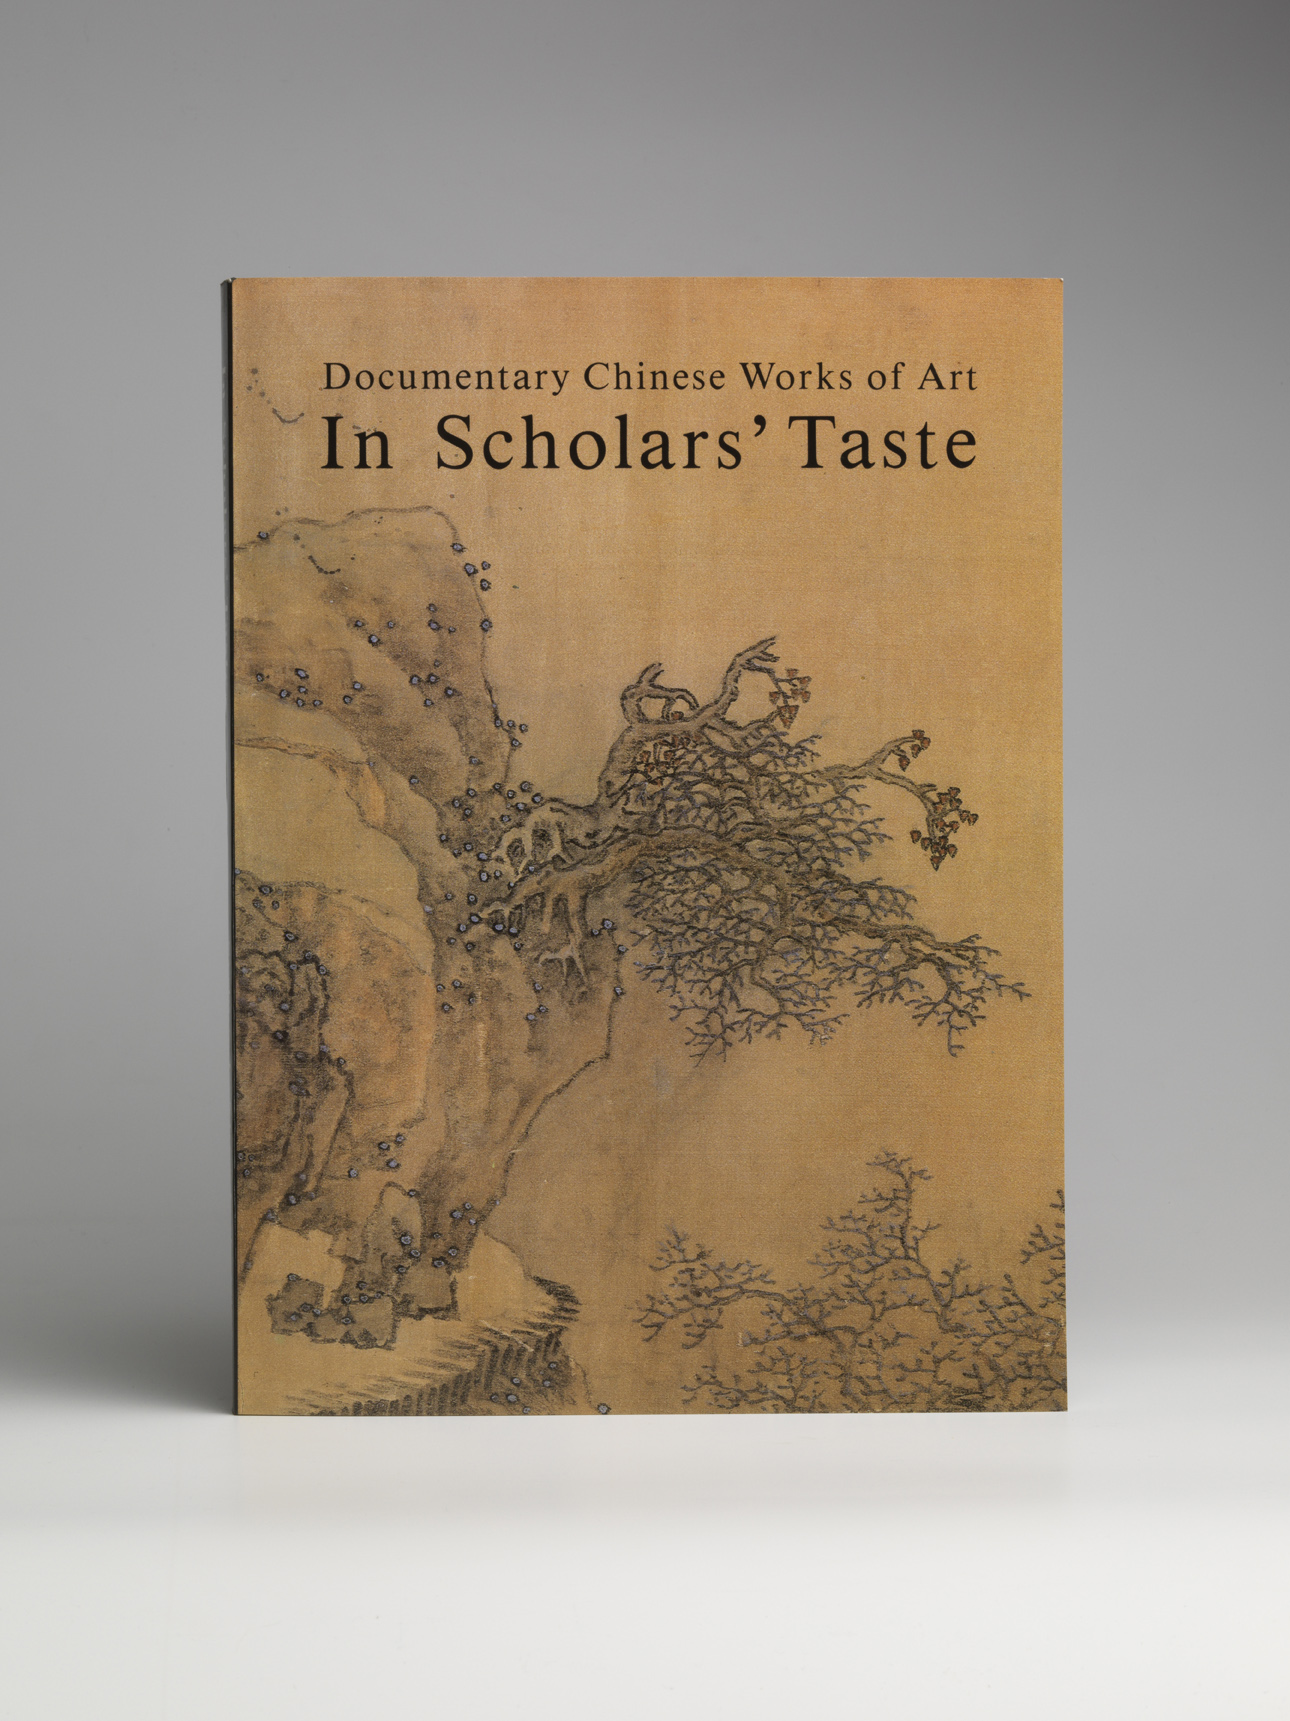 In Scholar's Taste-1.jpg